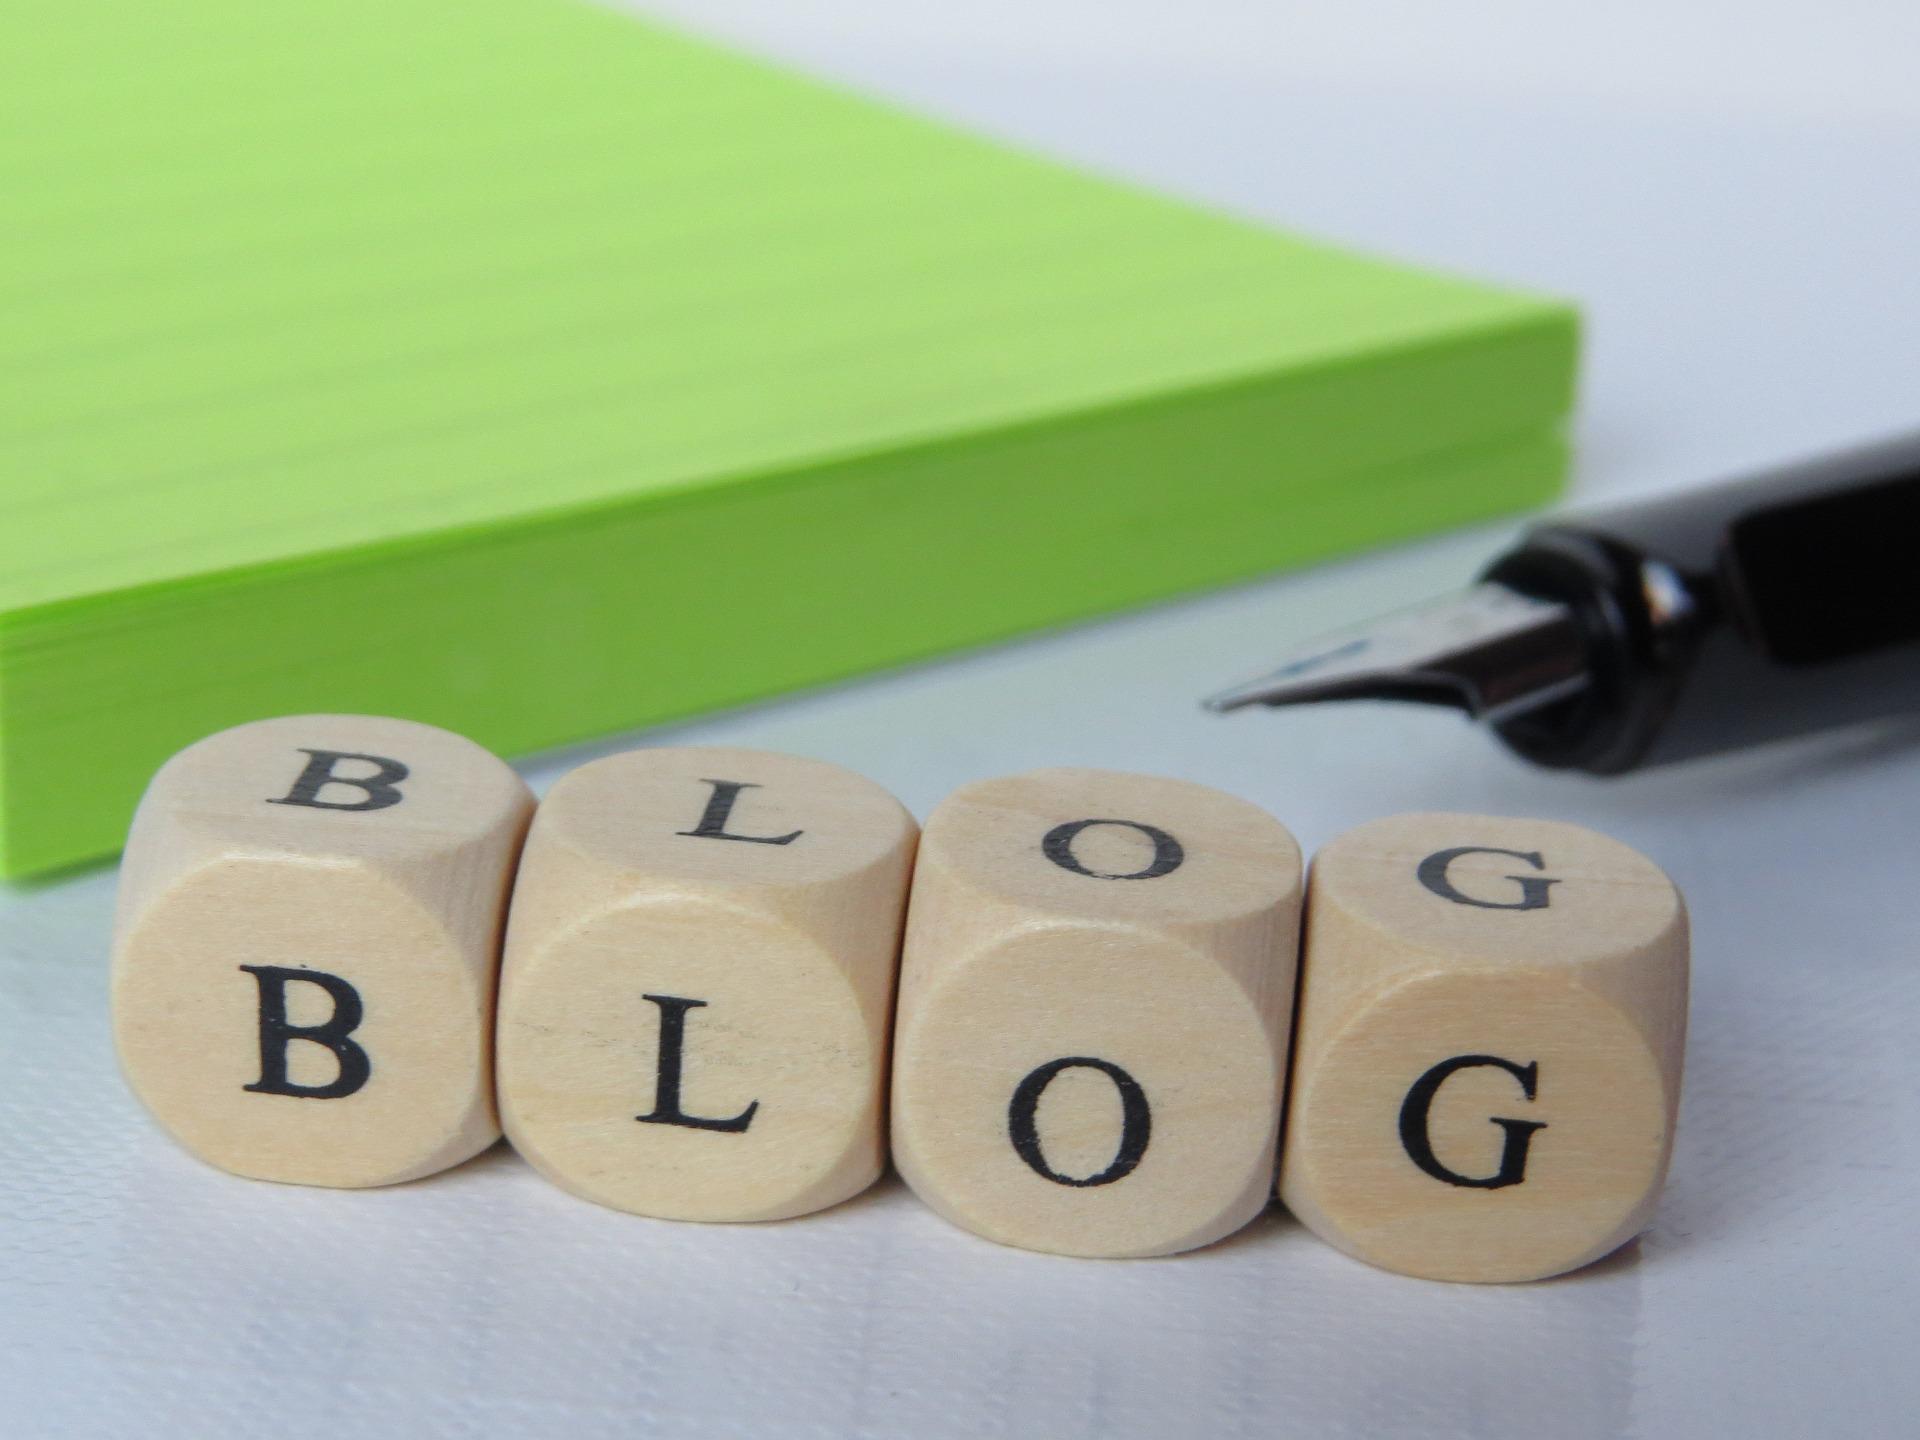 Influencer blogger Annecy